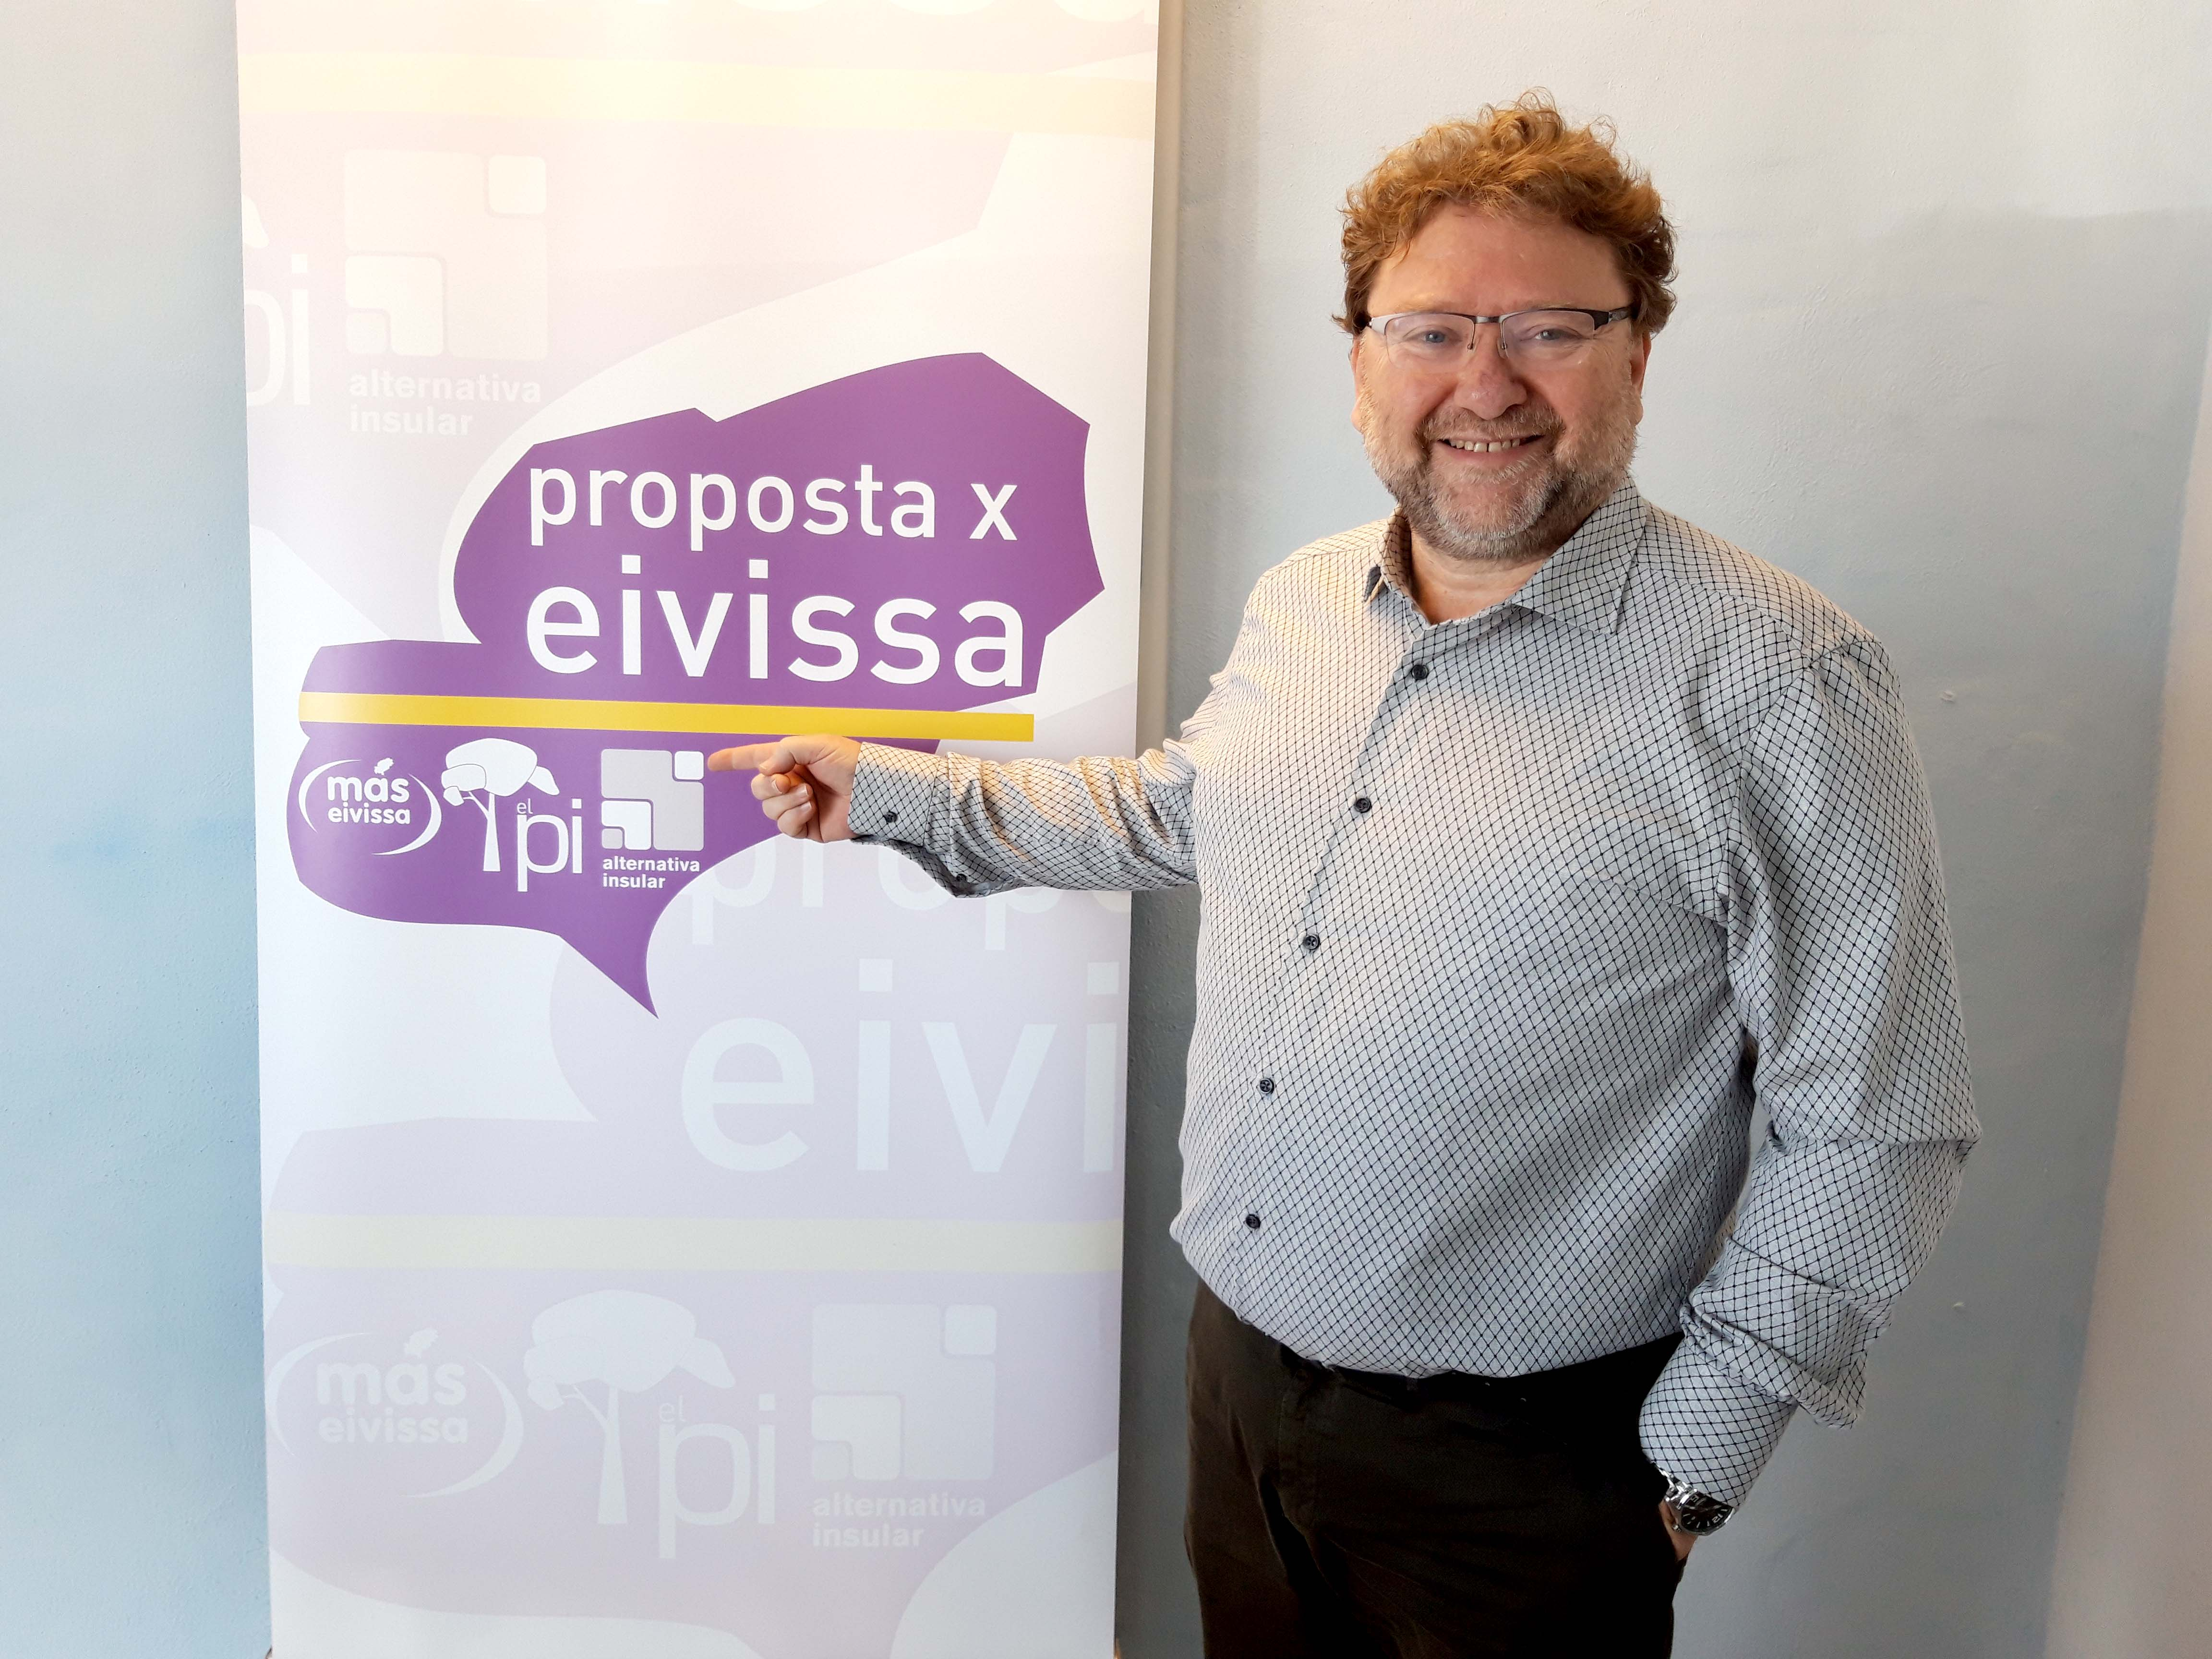 Vicent Jordi, Candidato a la Alcaldía de Sant Josep de sa Talaia por PxE